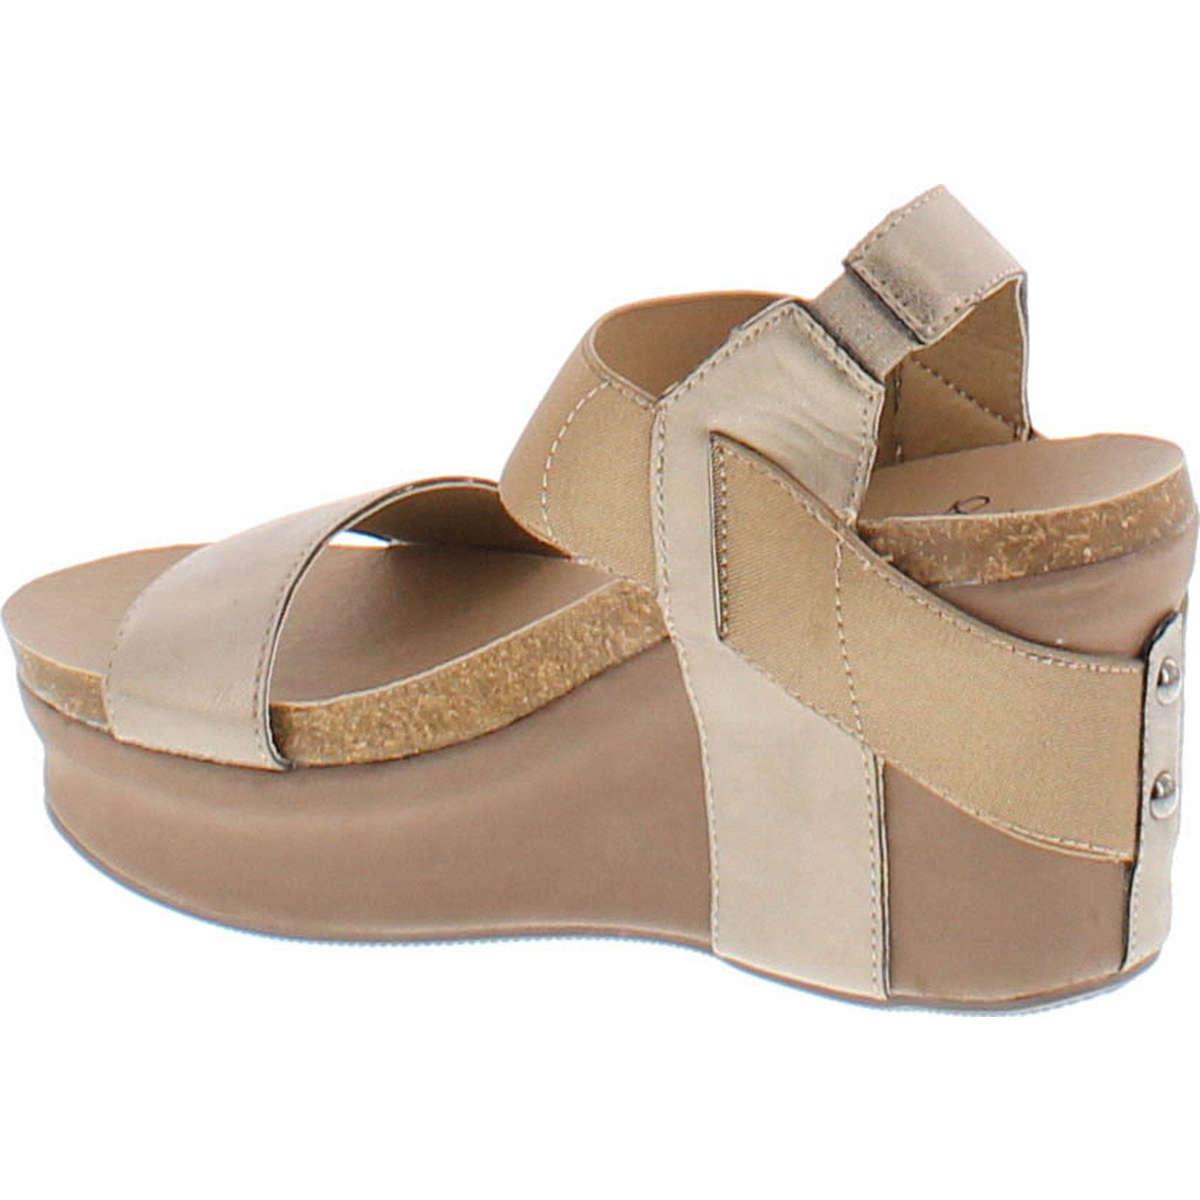 fcbeabba407c8d Corkys-Women-039-s-Wedge-Sandal